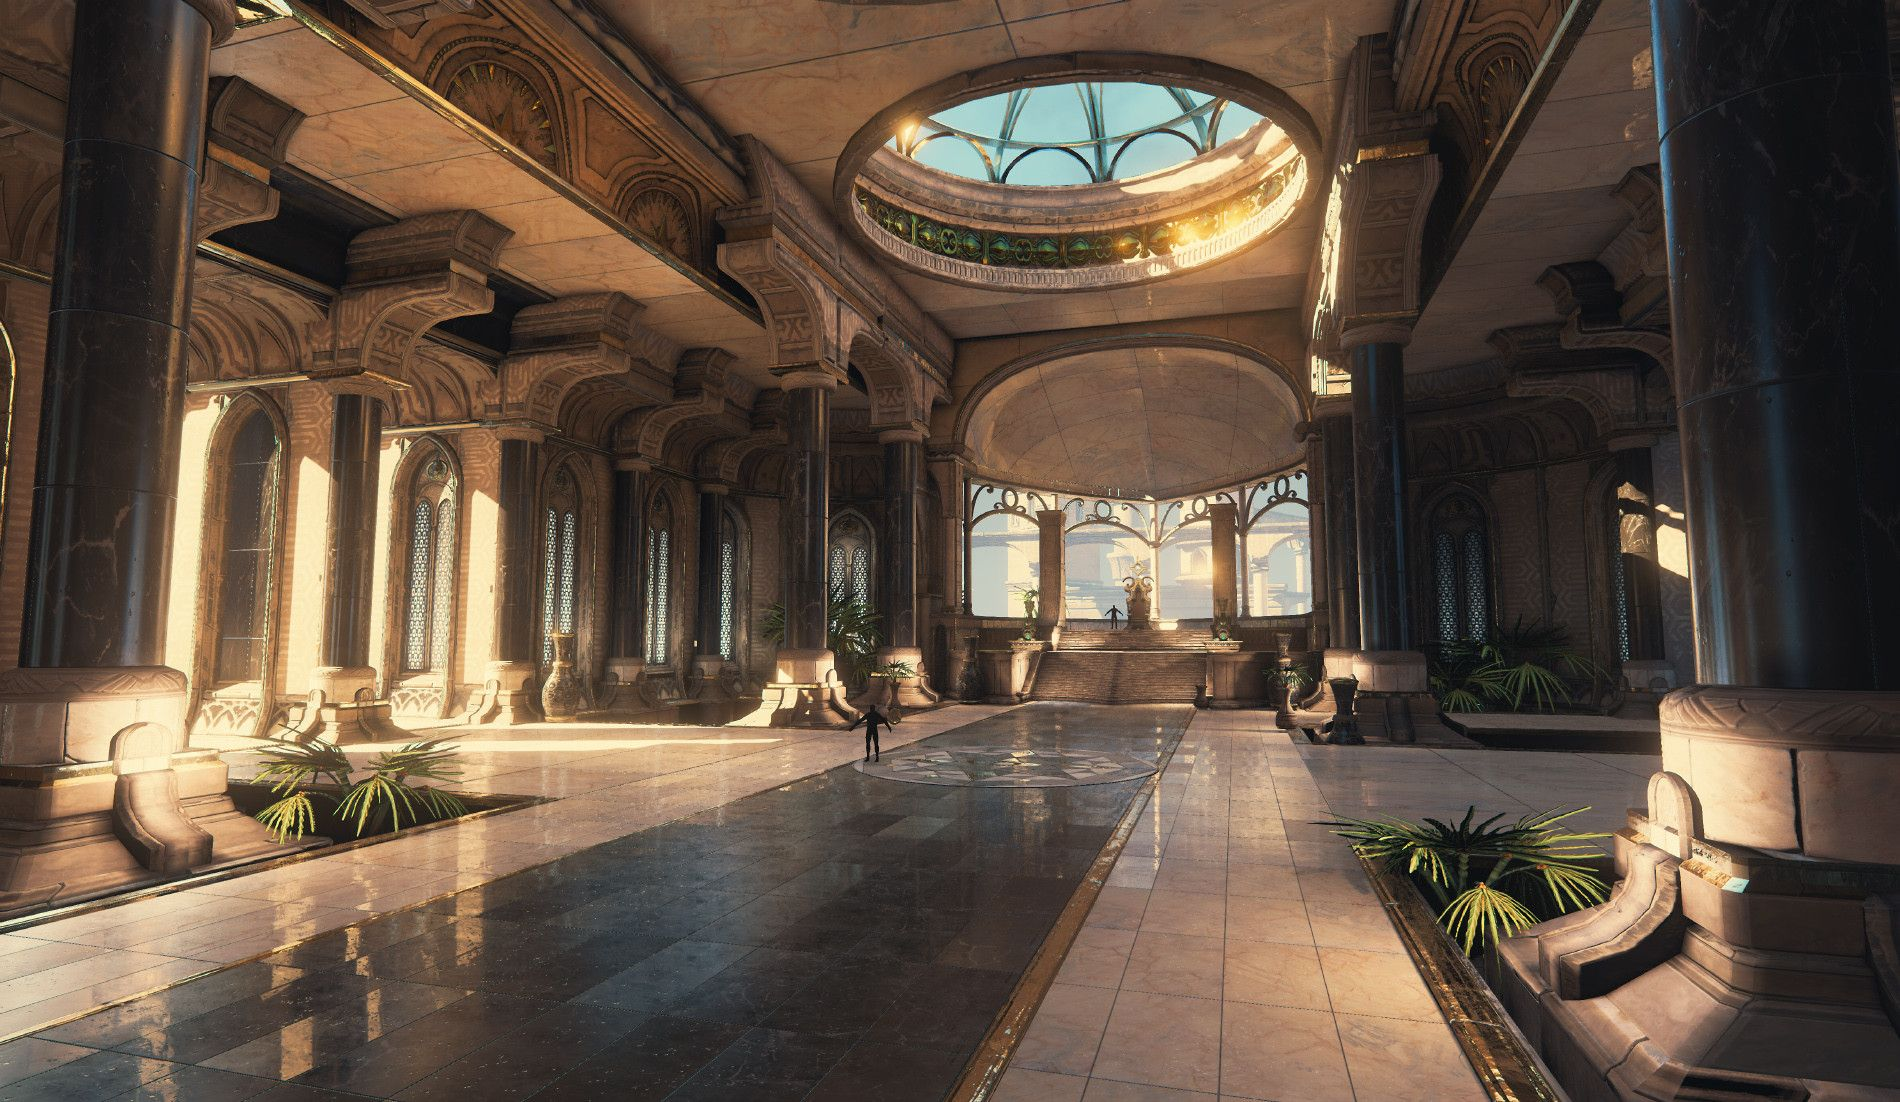 Places Pt 3 Fantasy Rooms Fantasy Art Landscapes Throne Room The top fantasy rooms